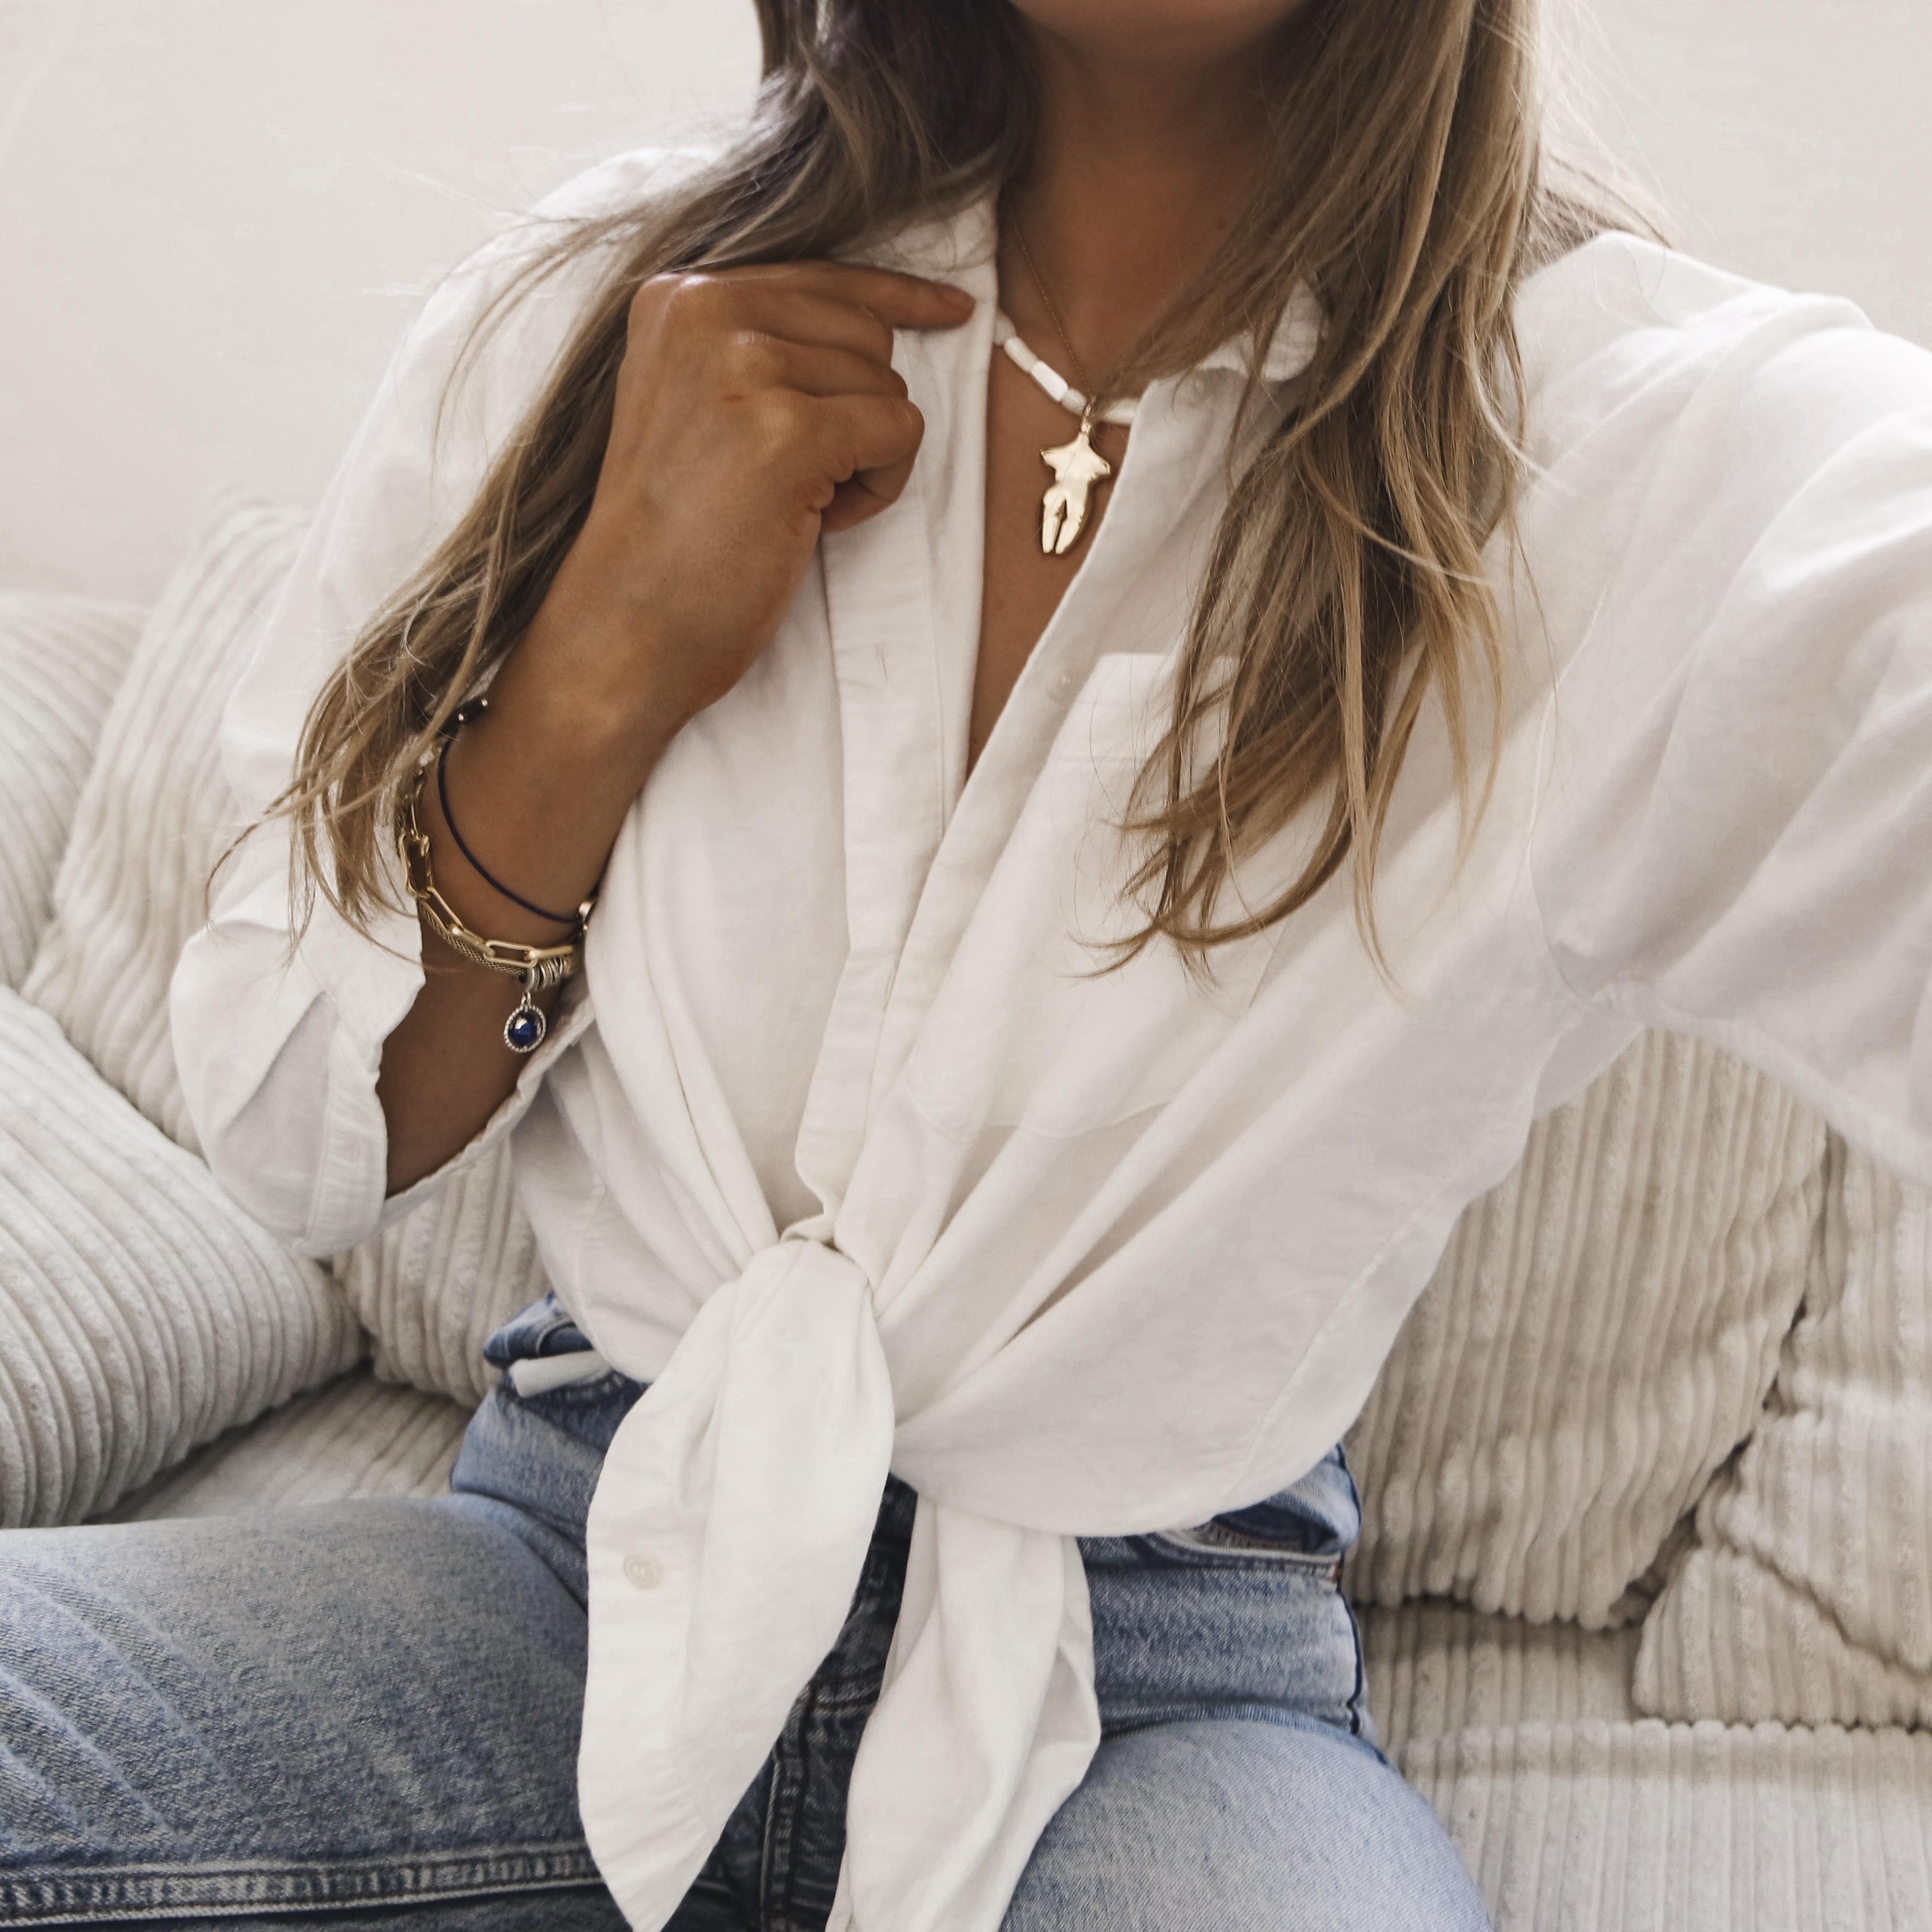 Online Shopping Edit - White Shirt